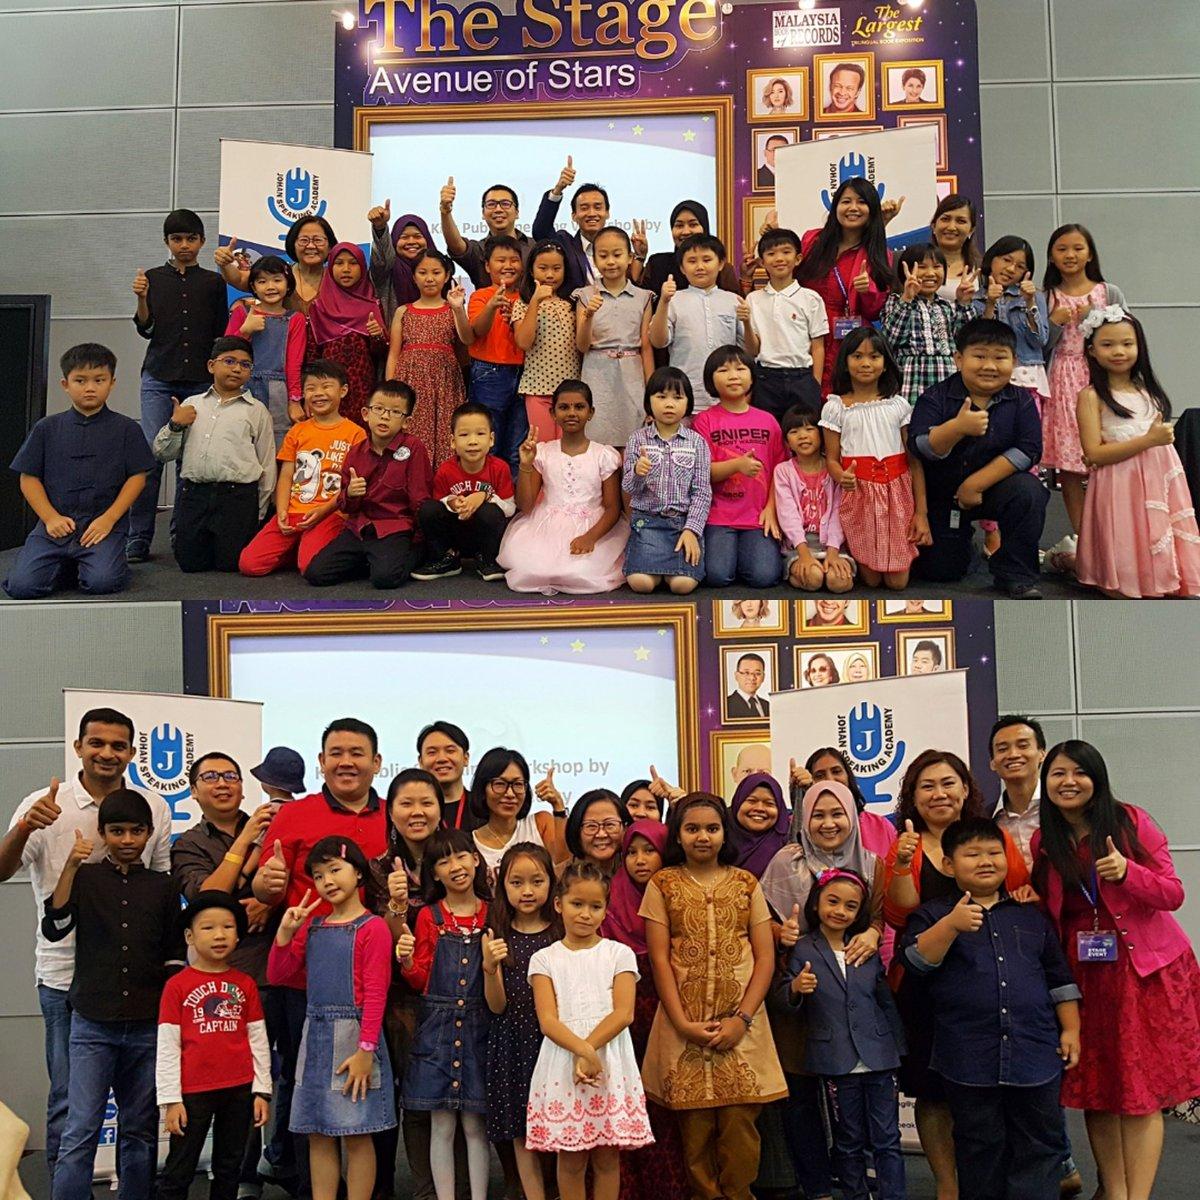 Great job kids, you are awesome. #kidspublicspeaking #johanspeakingacademy #popularbookfest #klcchall5 #klcc #stagetime #kids